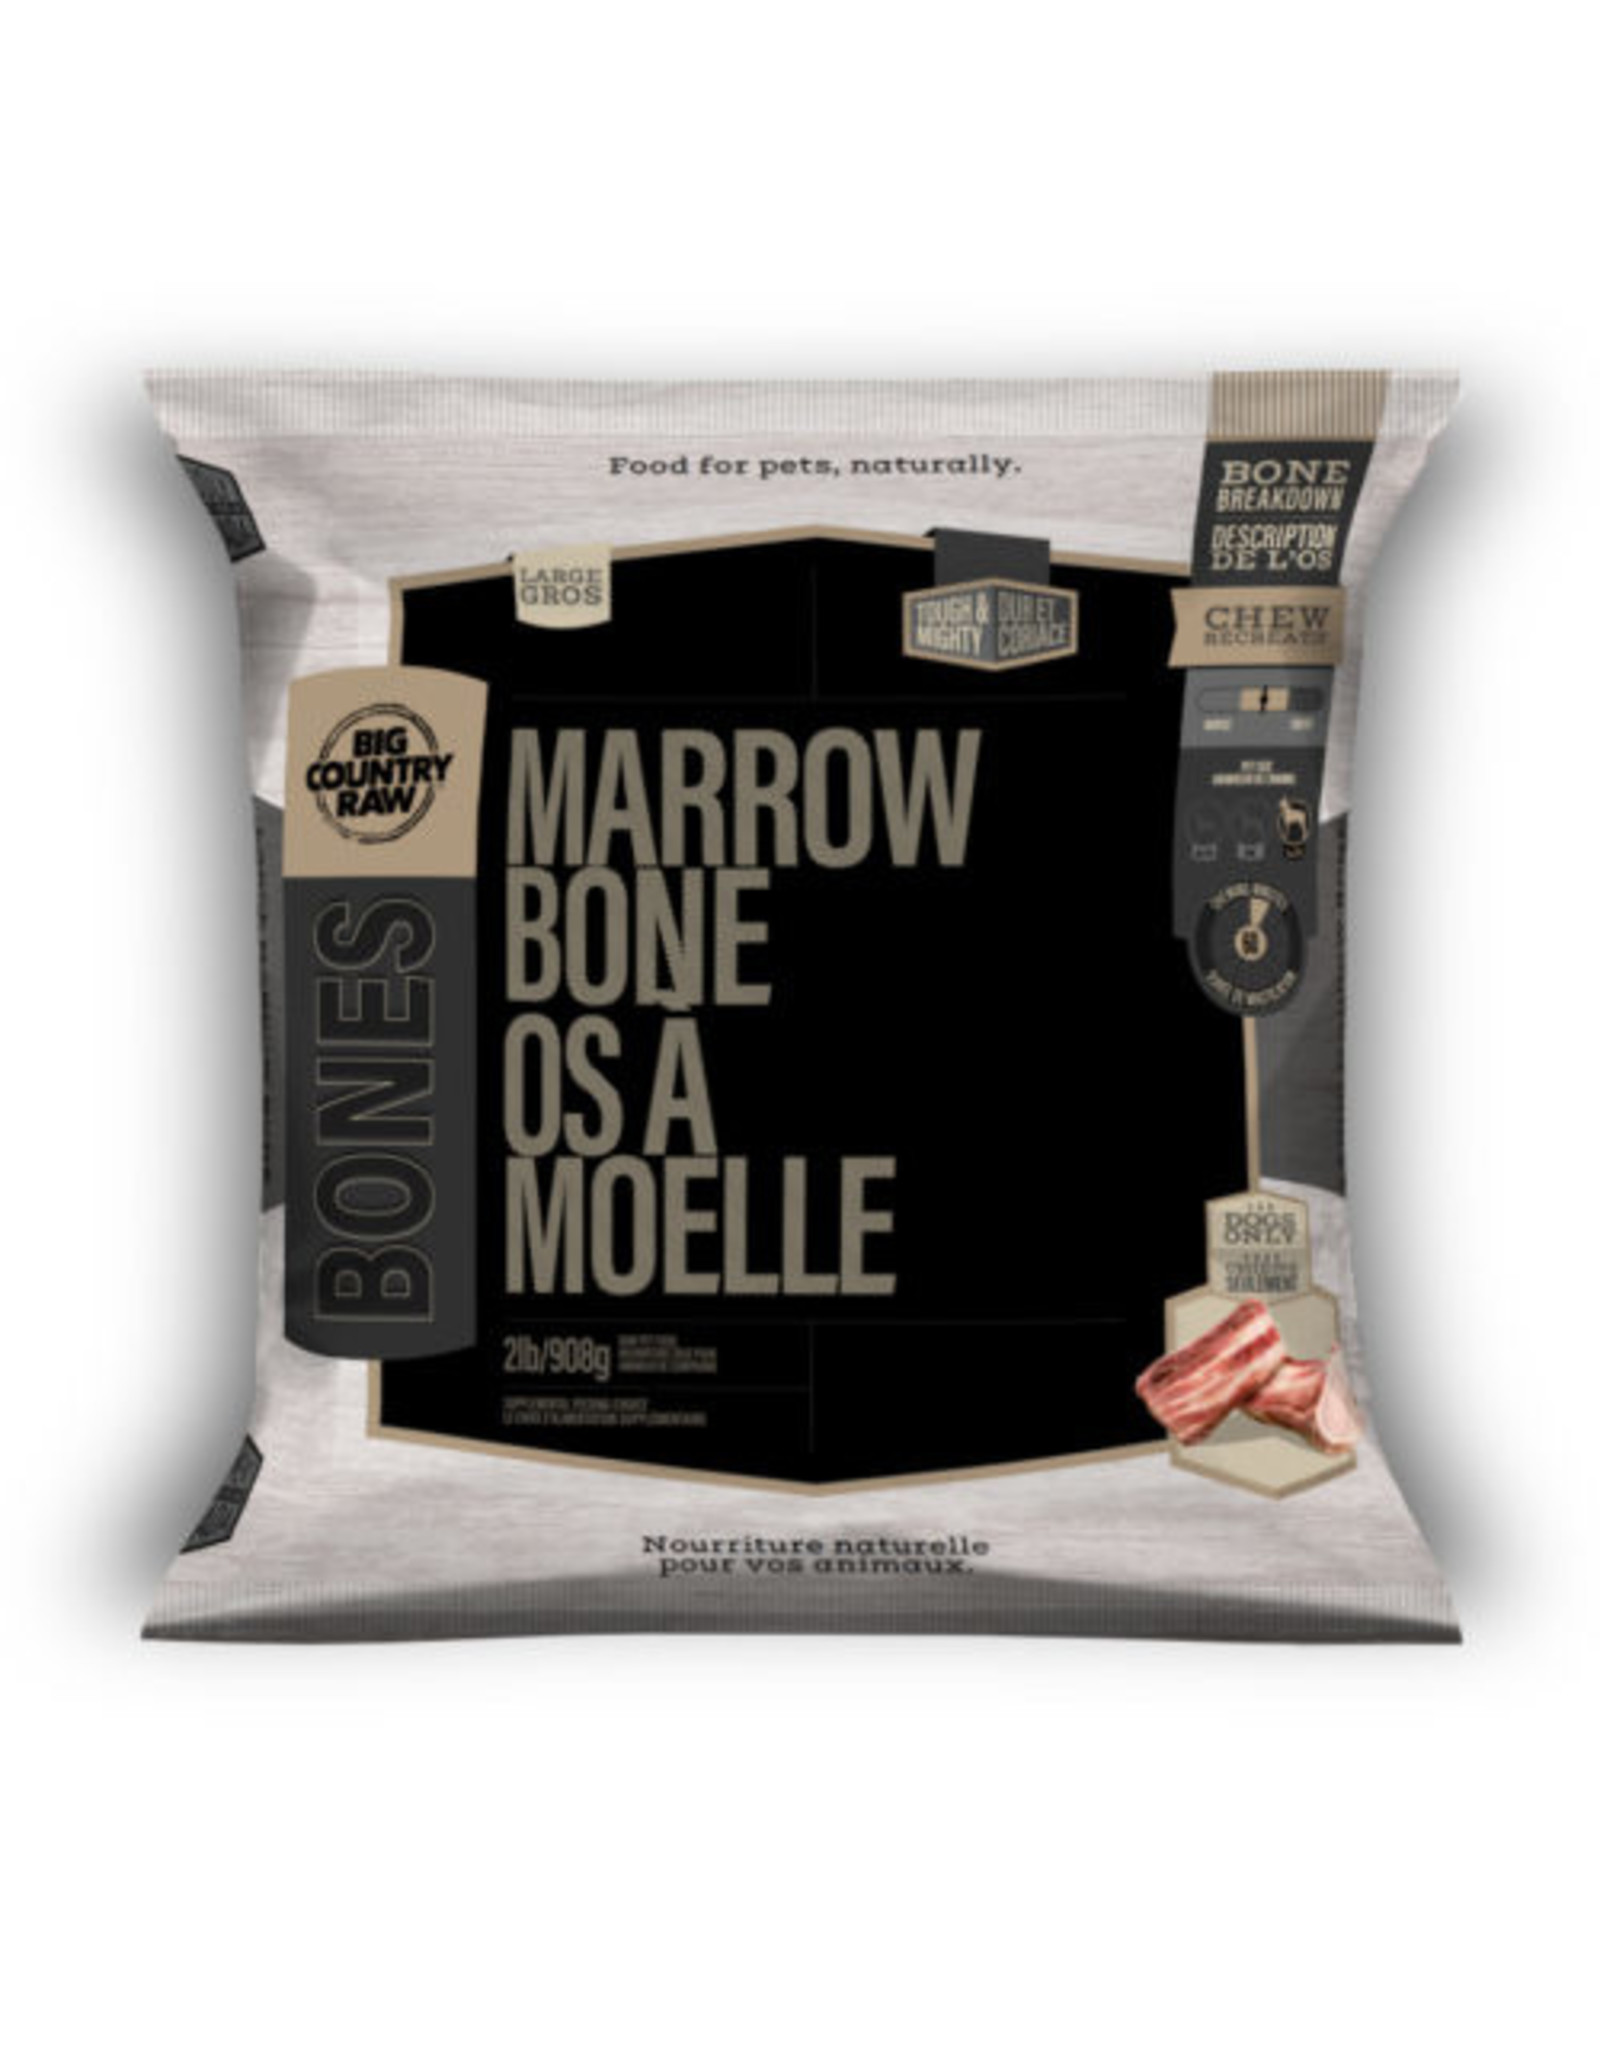 Big Country Raw Beef Marrow Bone Large 2lb Bag